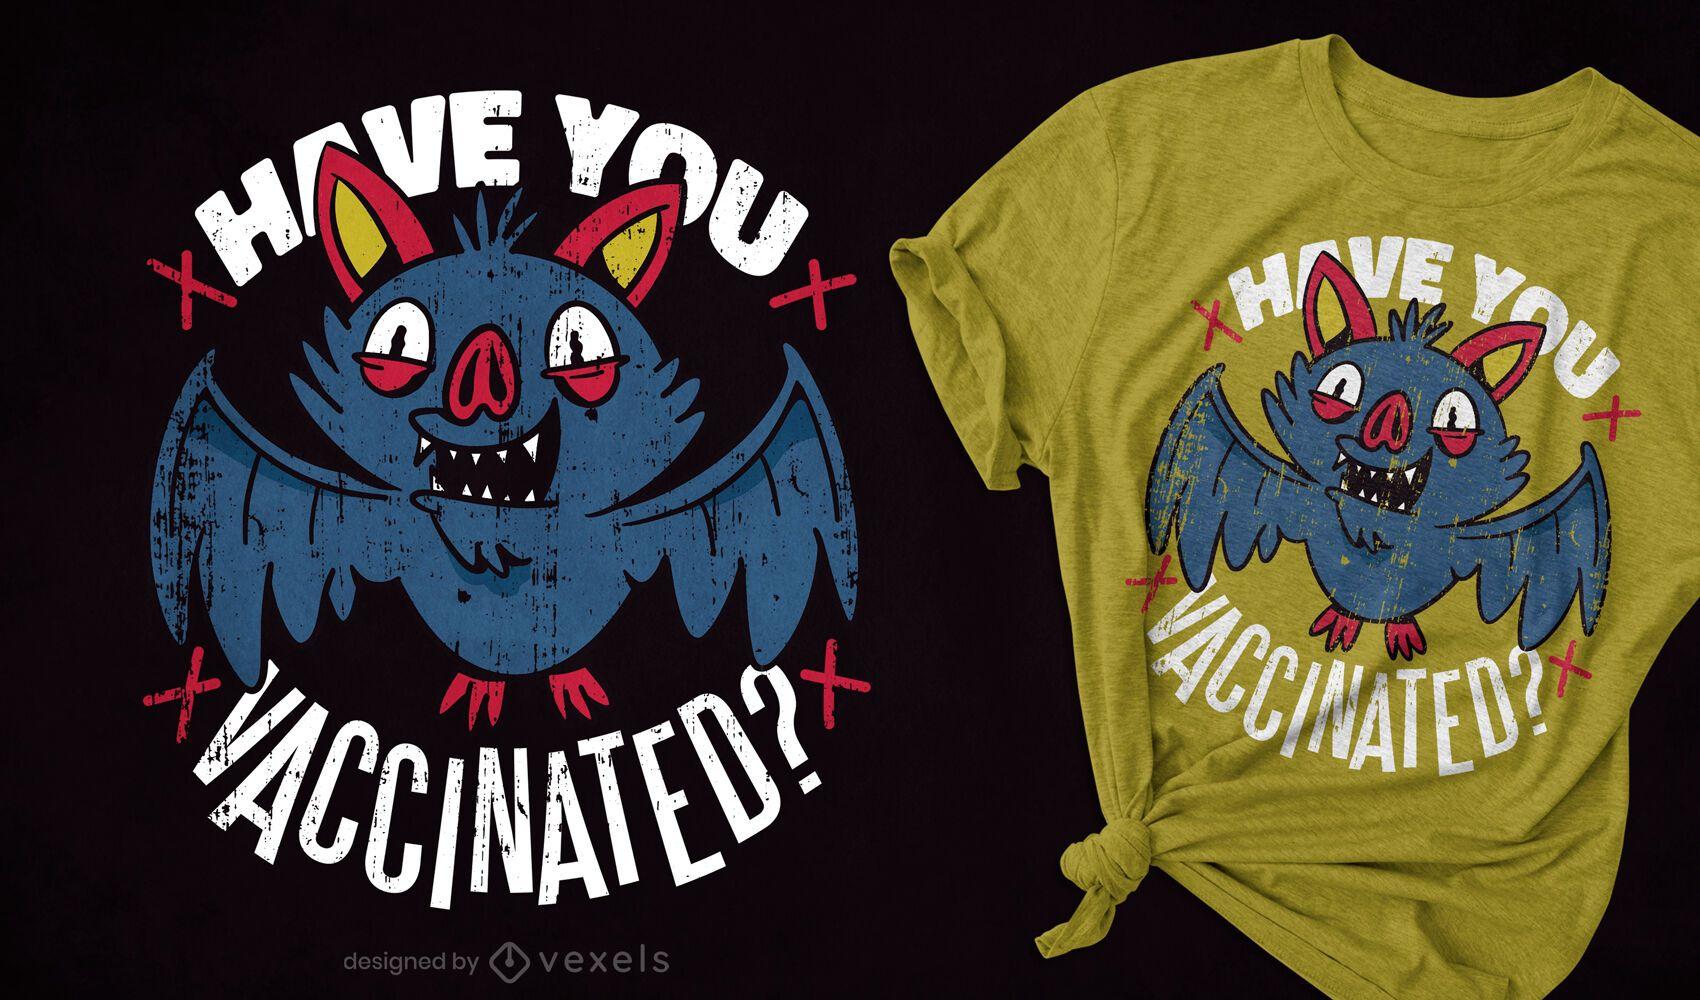 Vaccination bat quote t-shirt design